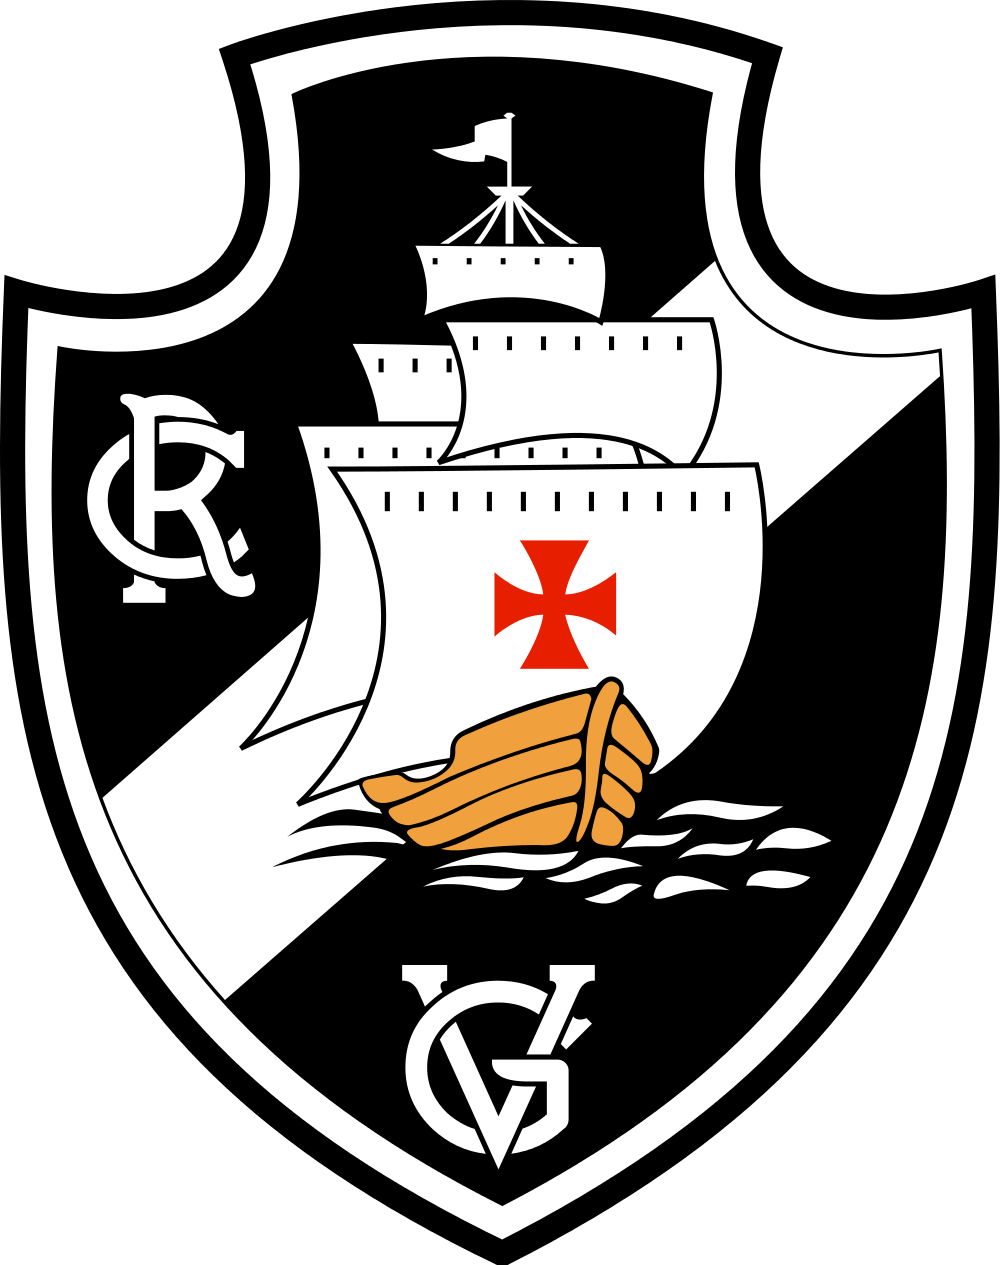 vasco logo escudo 3 - Vasco da Gama Logo